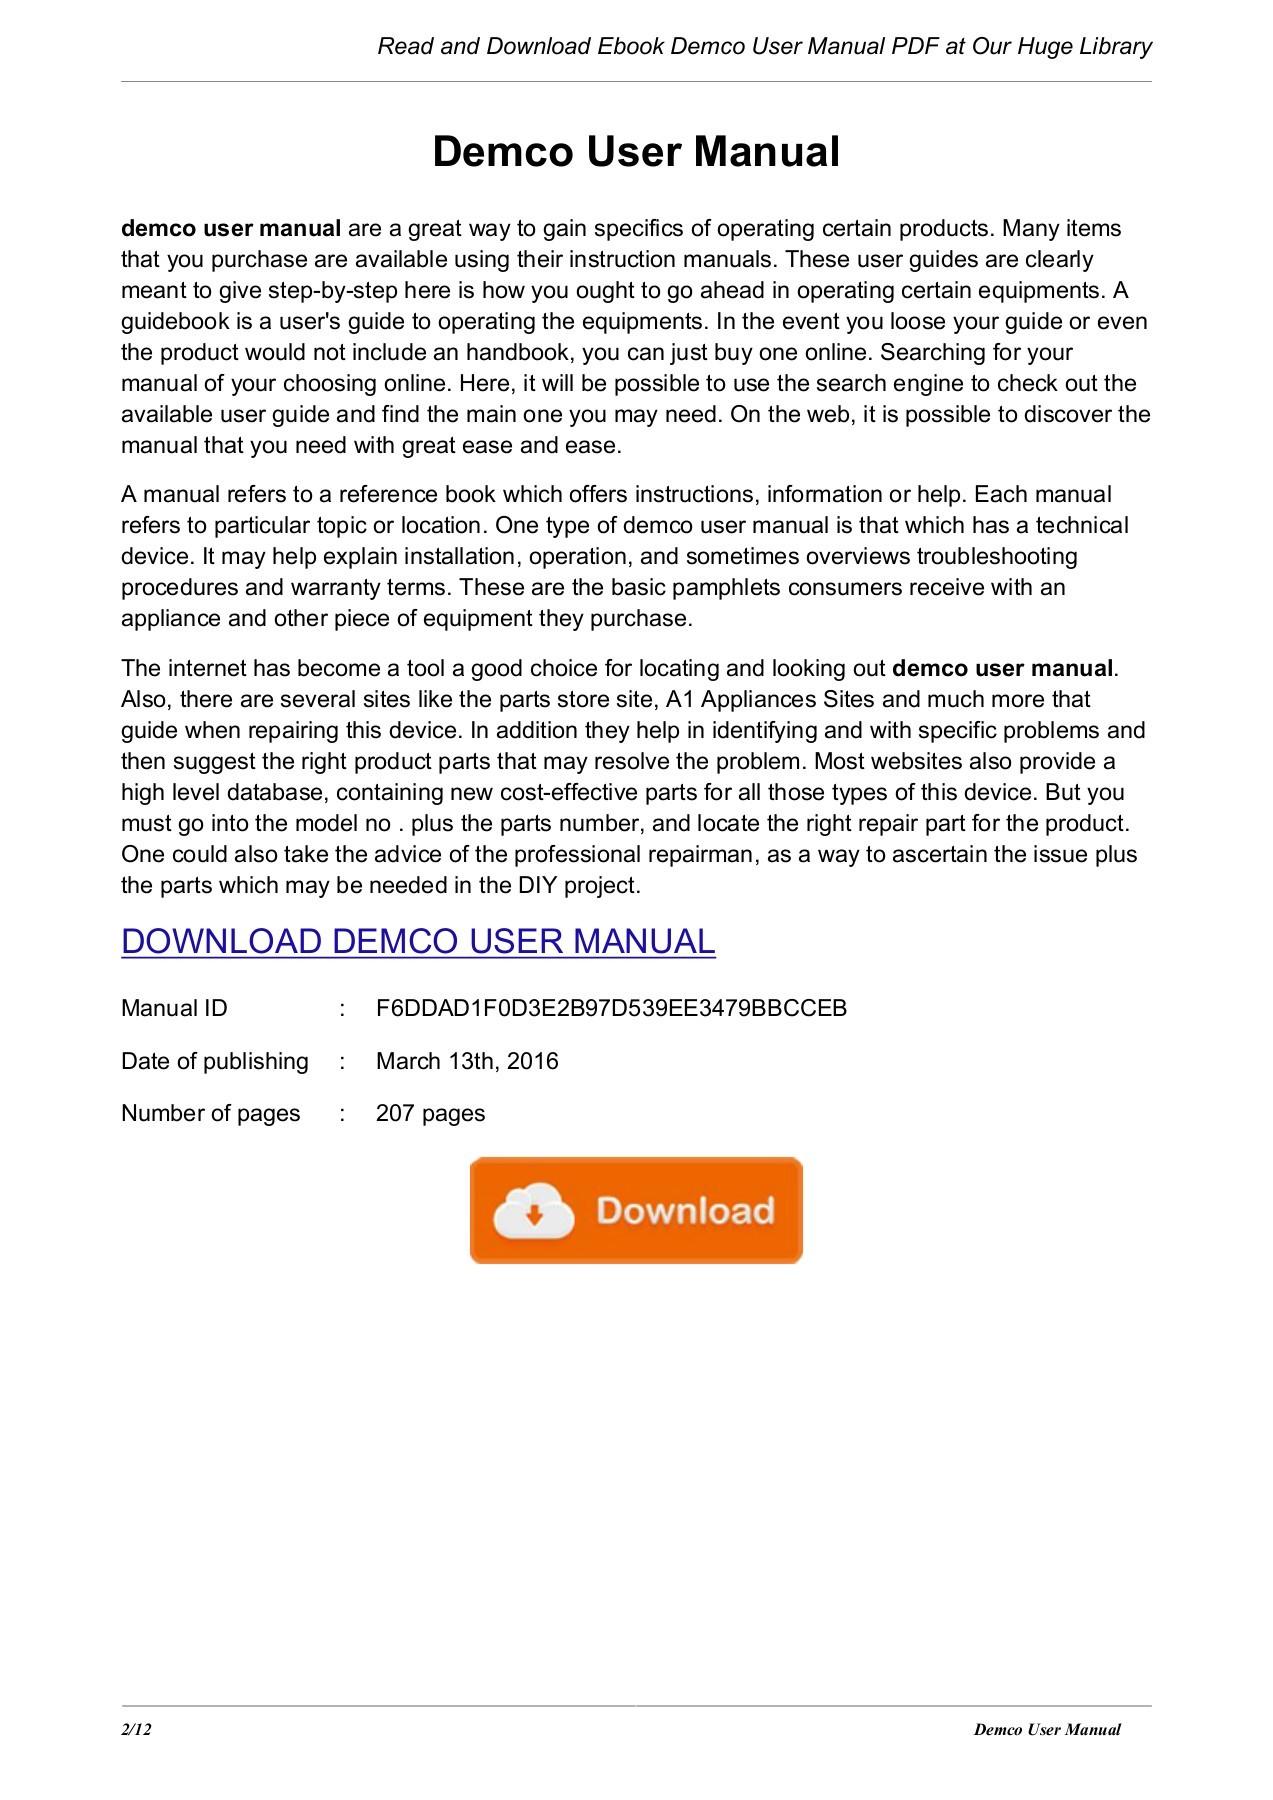 ... Array - manual javascript espa c3 a3 c6 92 c3 a2 c2 b1ol rh  signaturepedagogies org